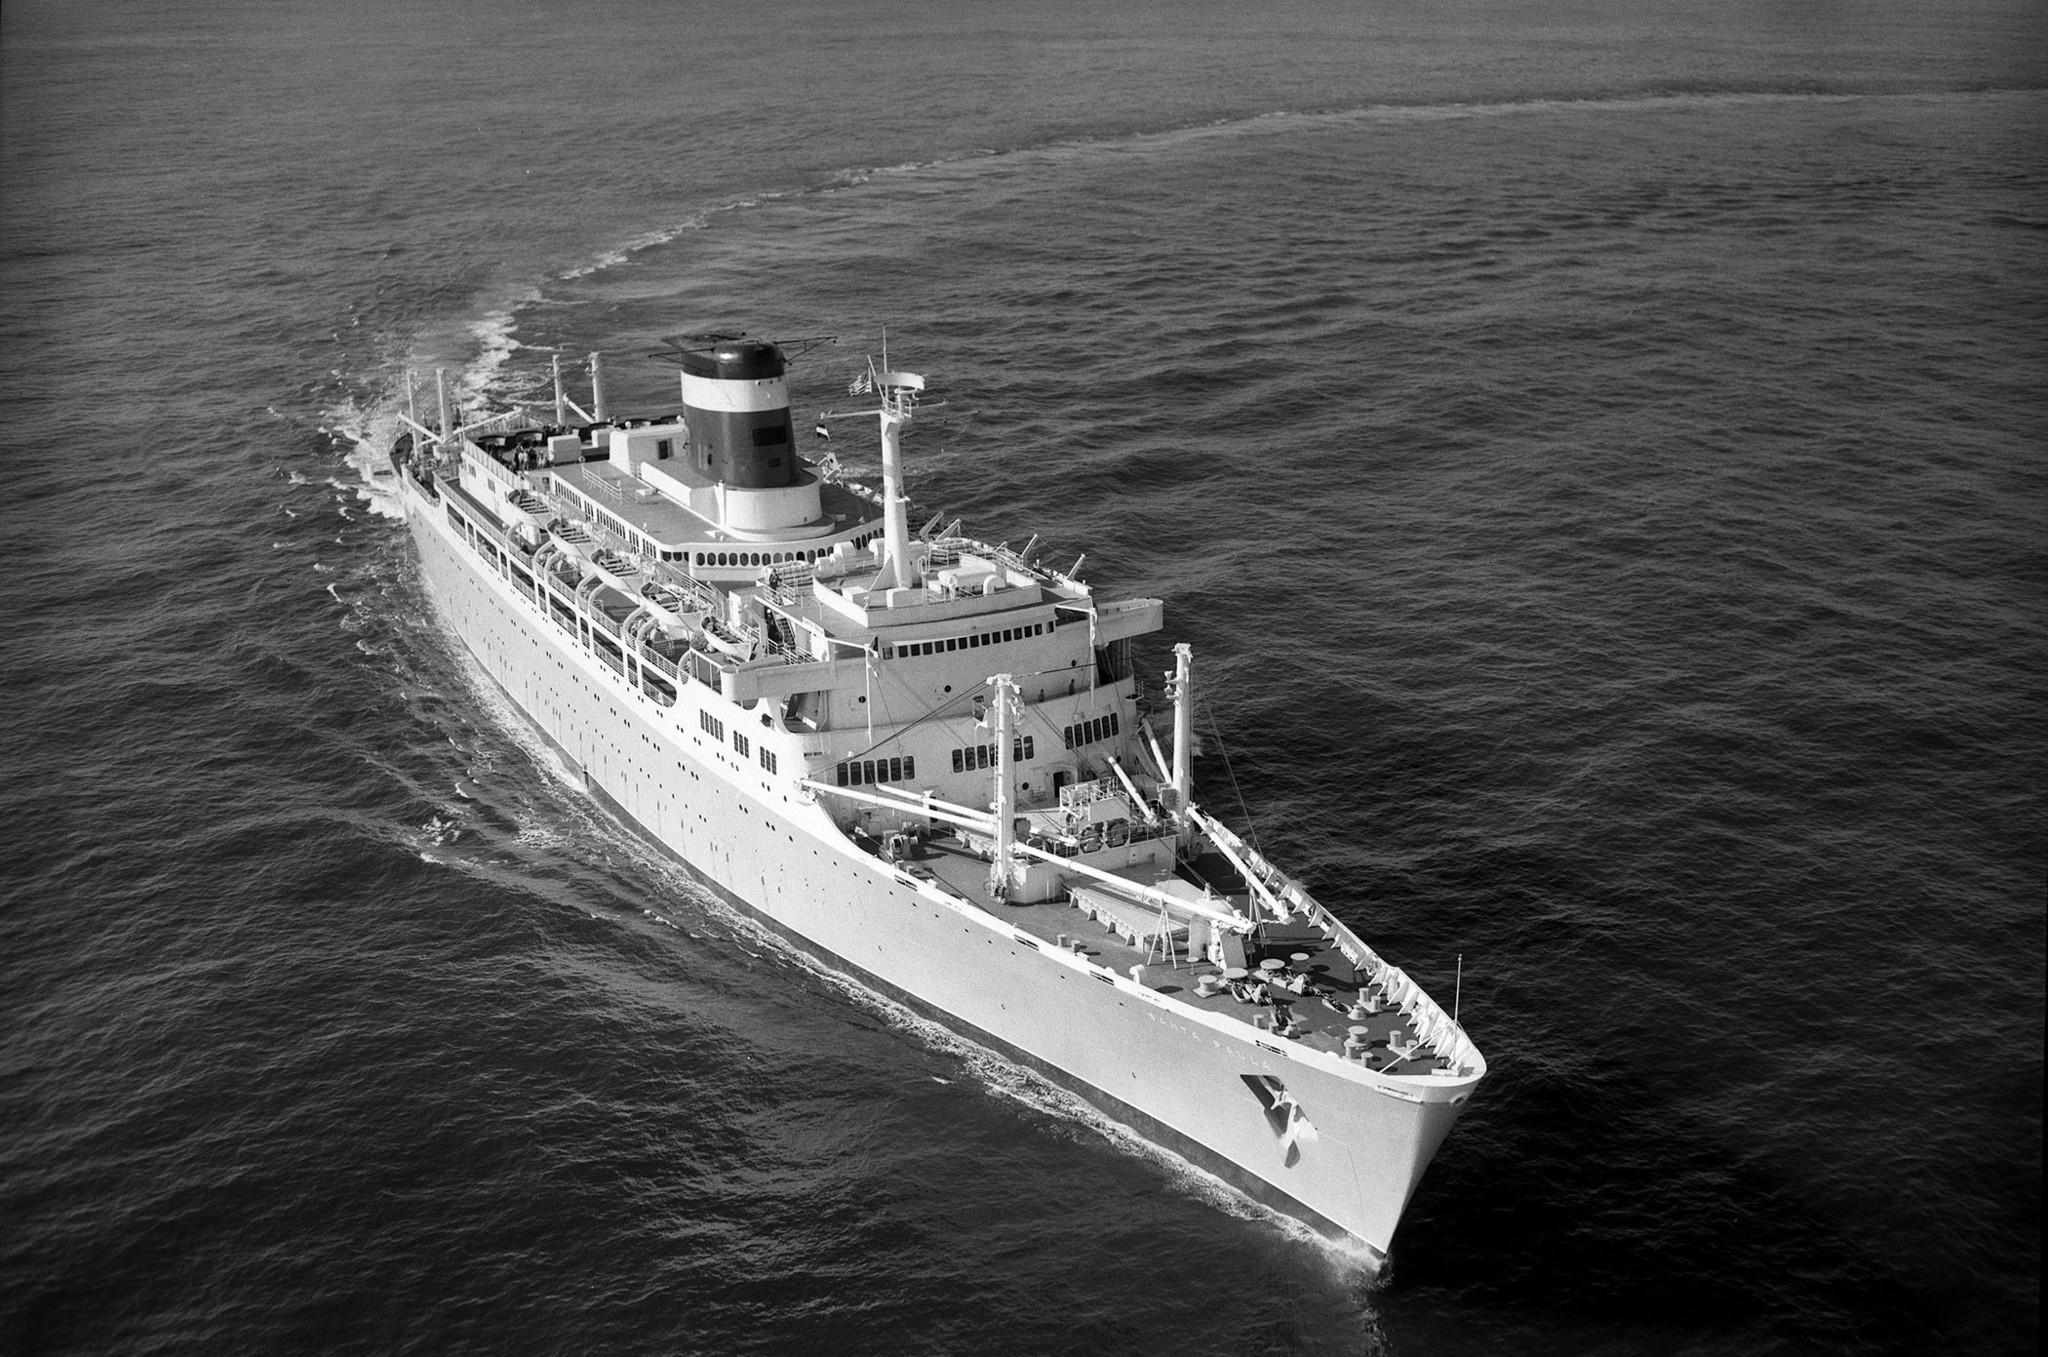 Newport News Shipbuilding S Last Passenger Ship The Ss